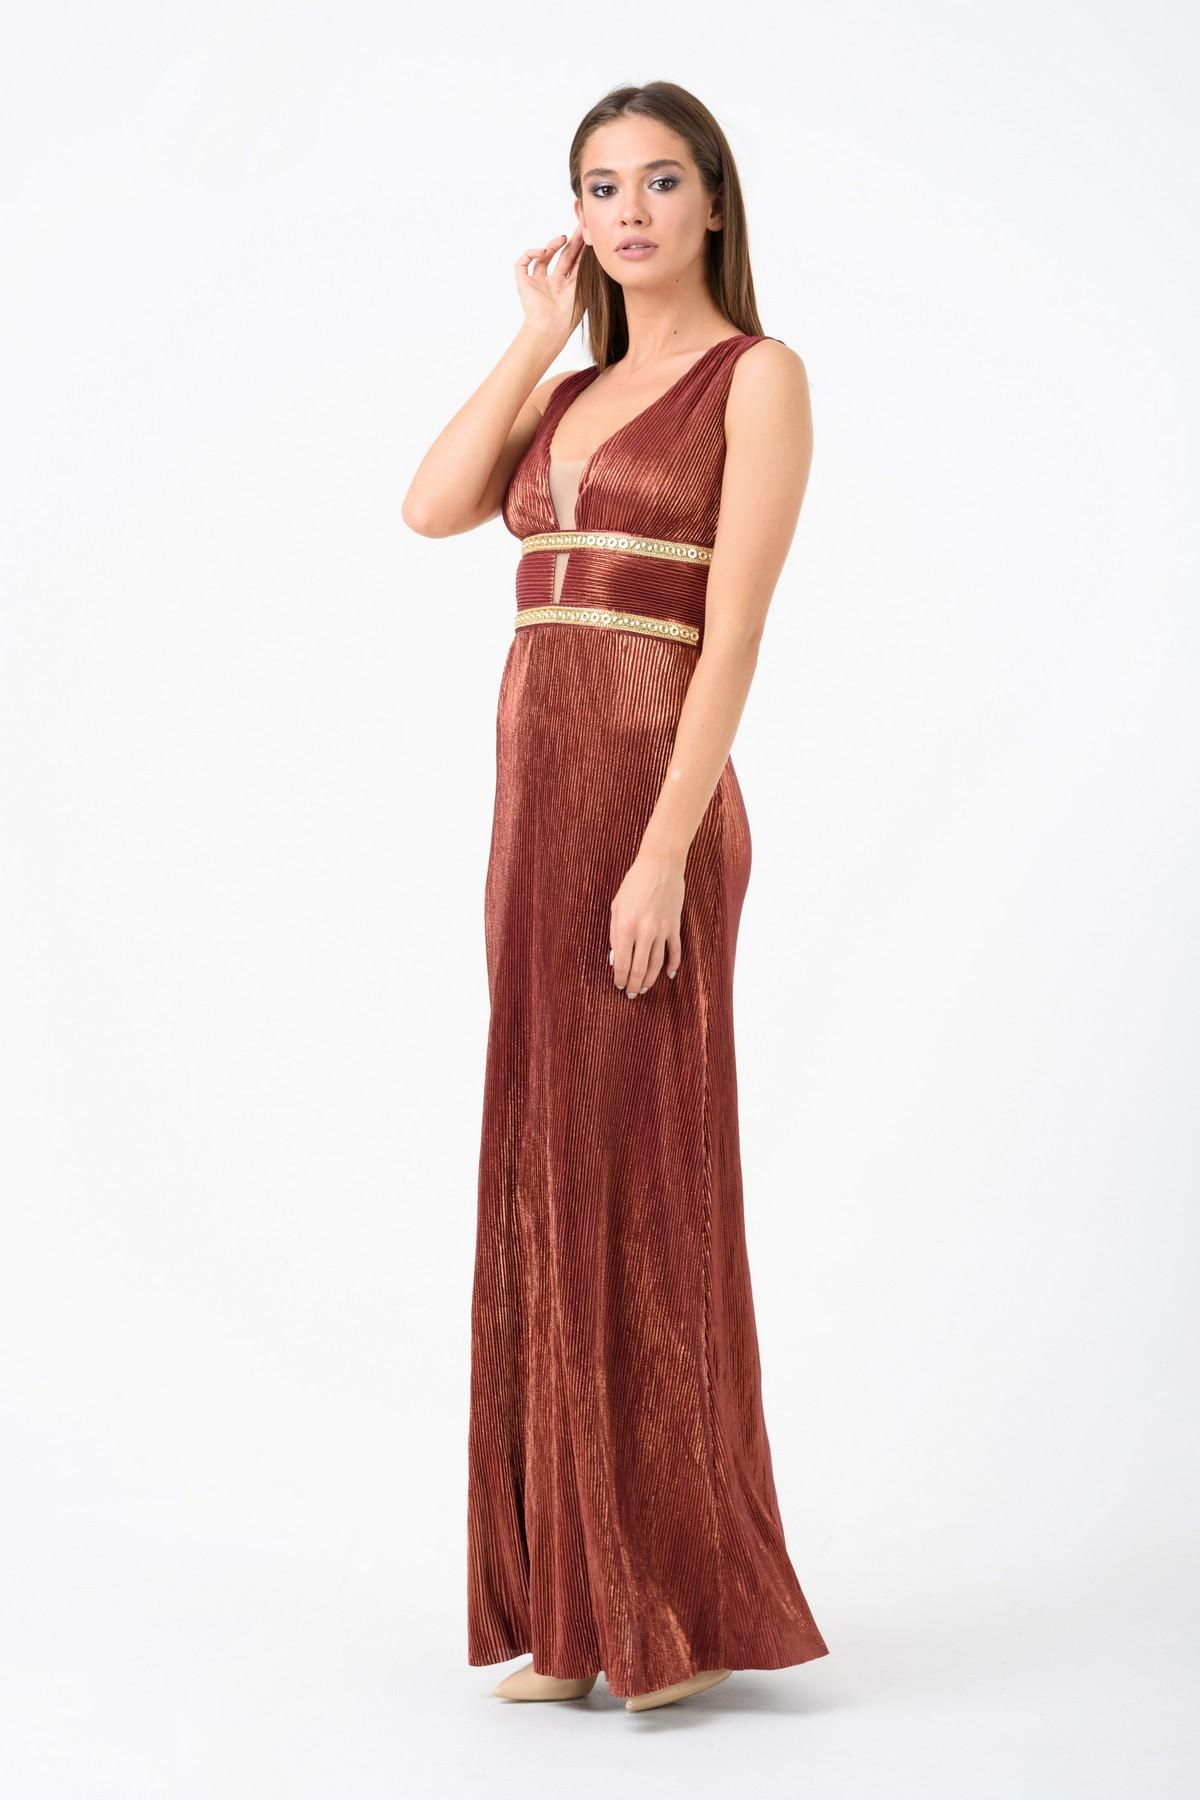 918f1947b9d Вечернее платье из жатого трикотажа RM1910-18VP